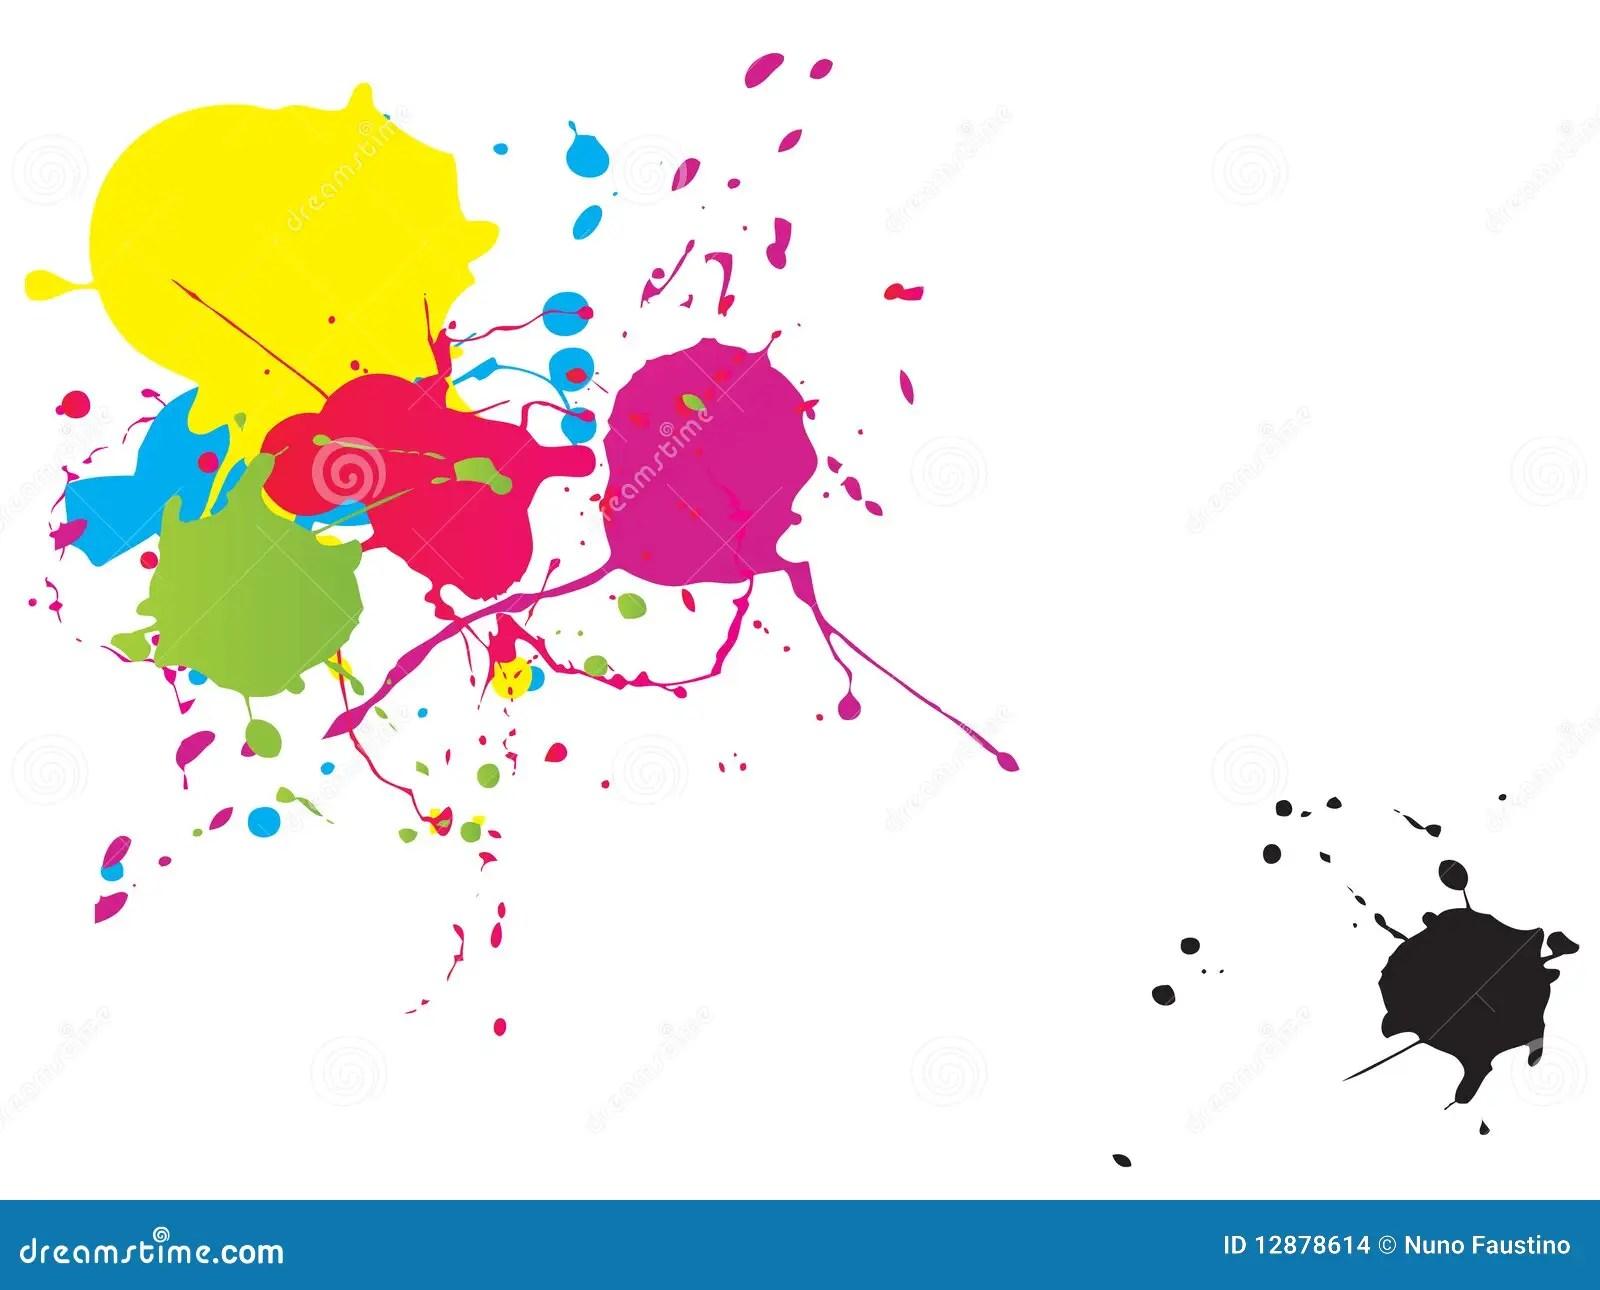 Dirty Girl Wallpaper Download Splash Painting Stock Illustration Image Of Splotches